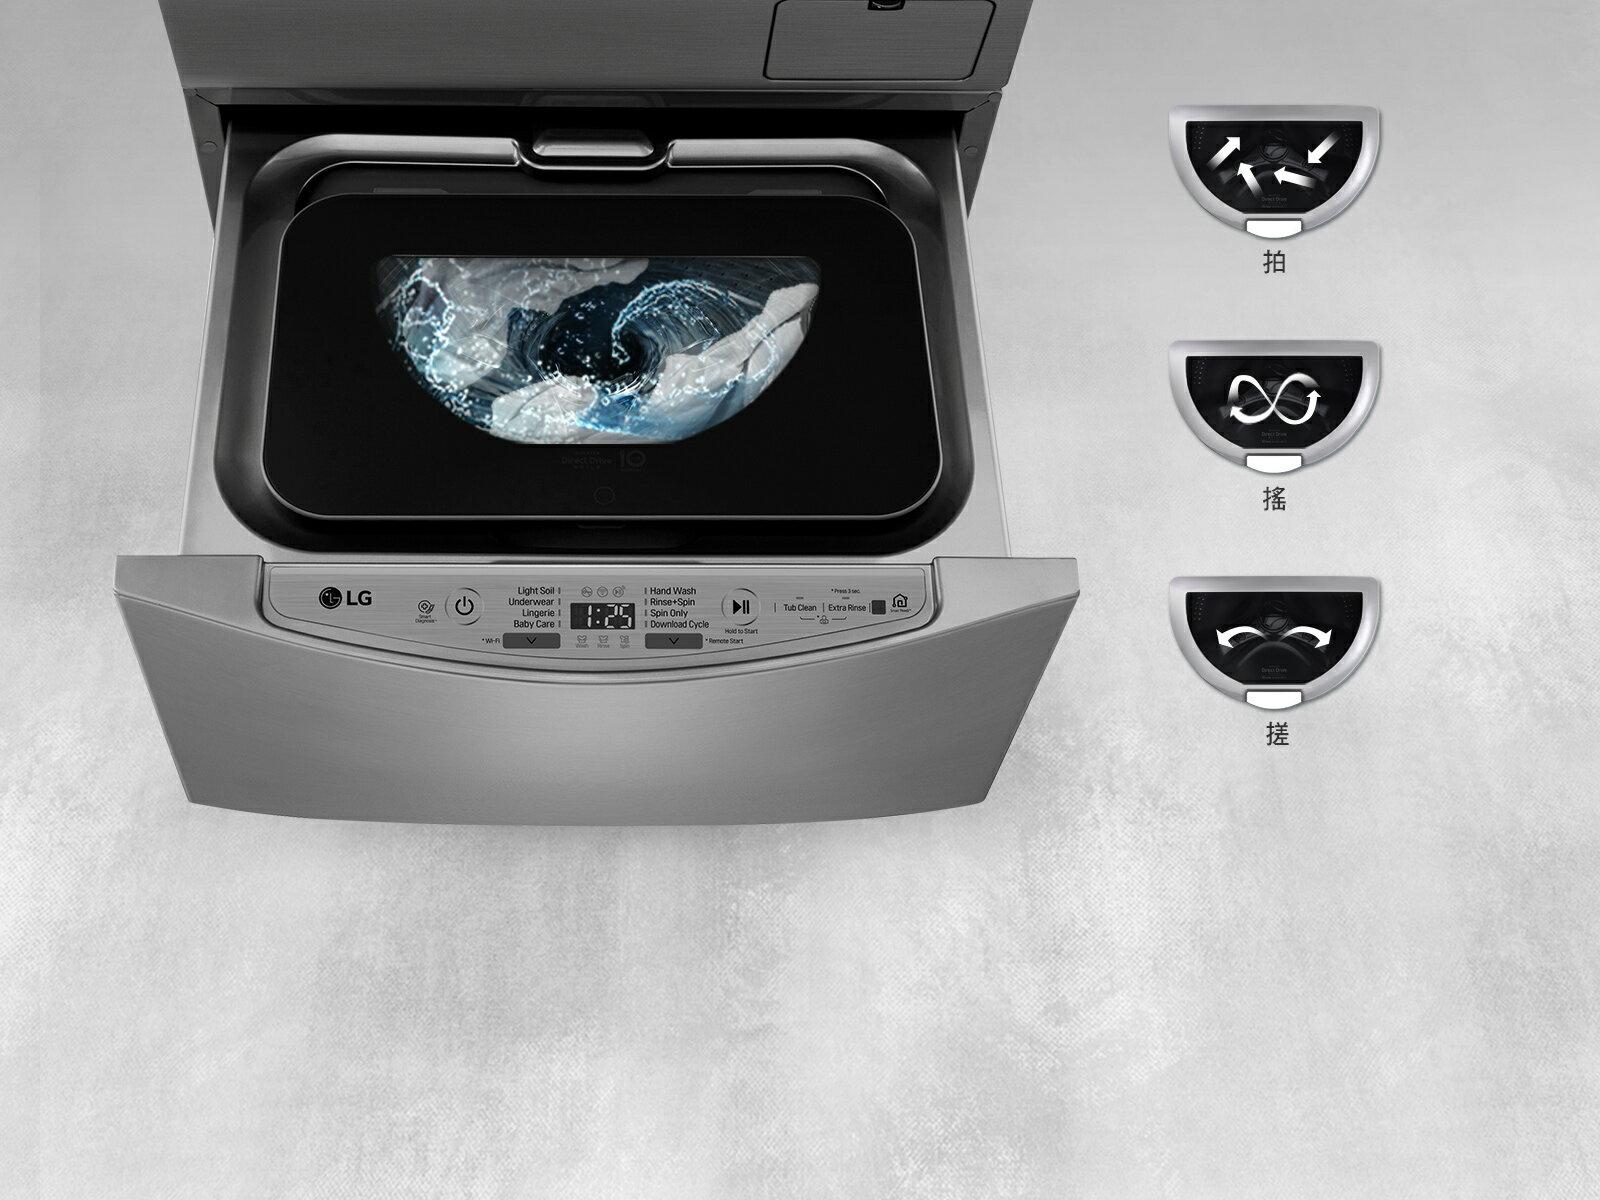 LG 樂金 2.5公斤  MiniWash 迷你洗衣機 加熱洗衣 遠東控制 WT-D250HW(冰磁白)